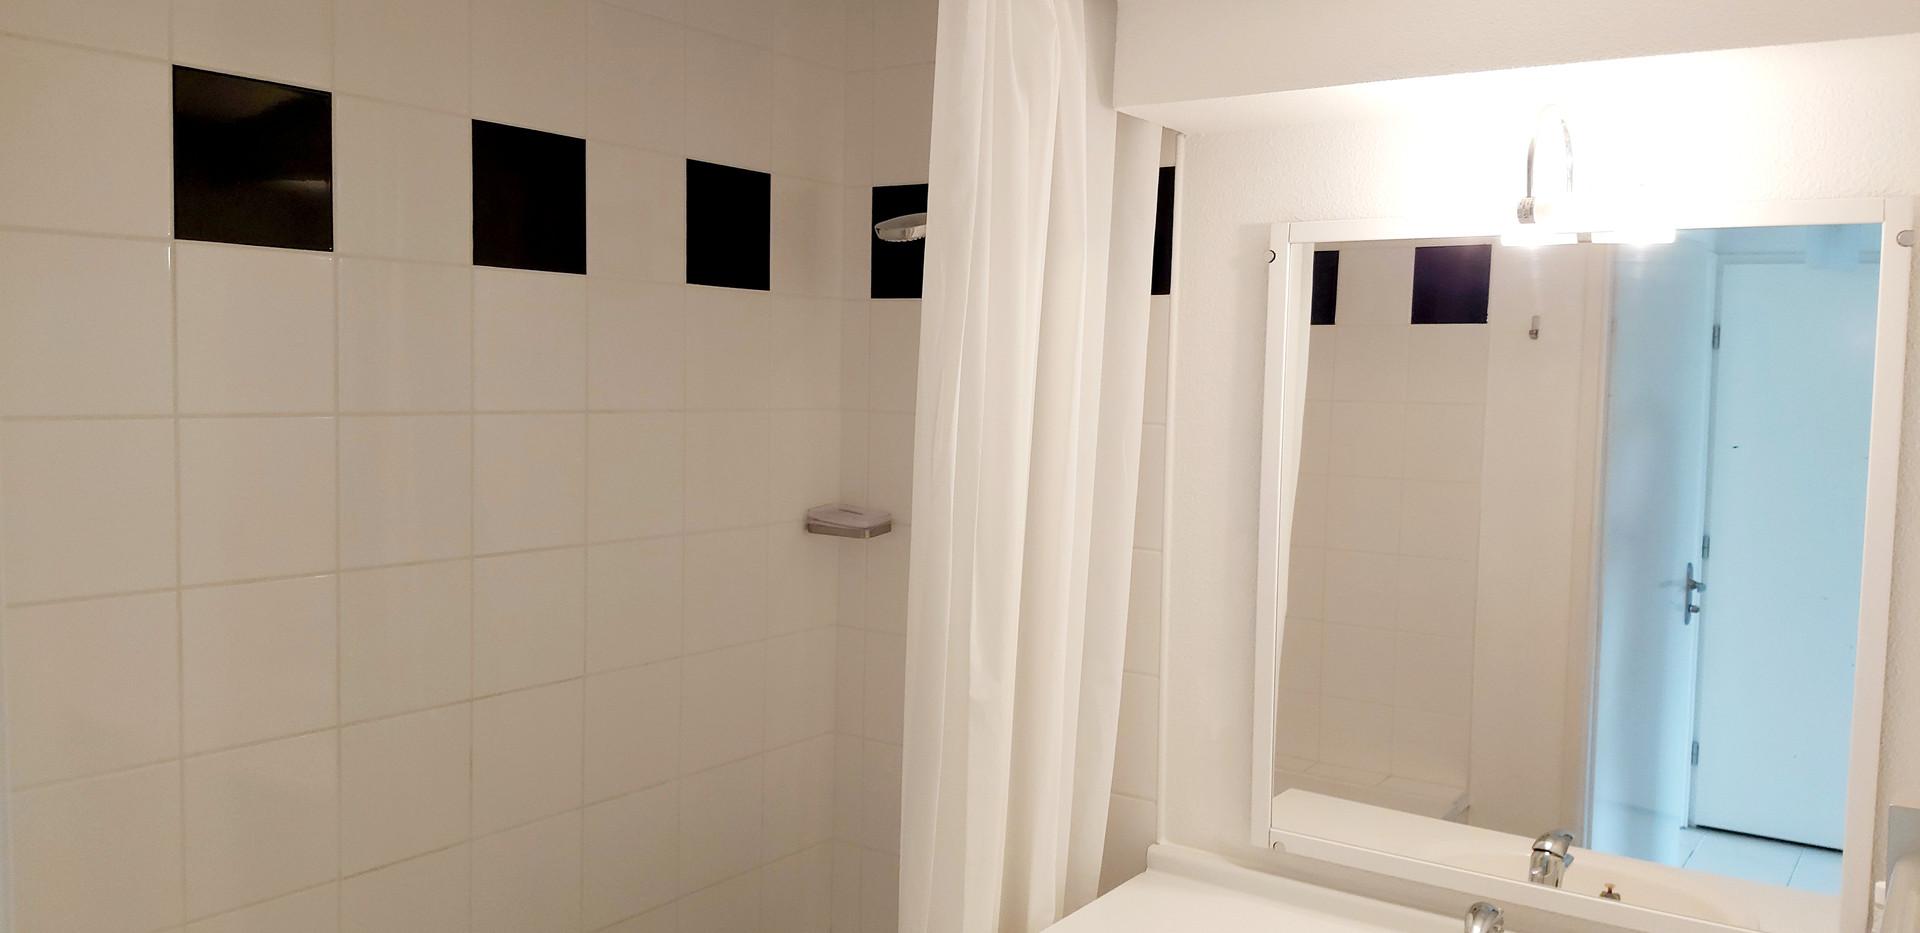 Appartement T2 - 2 pers - Salle de bain - Location de vacances gers